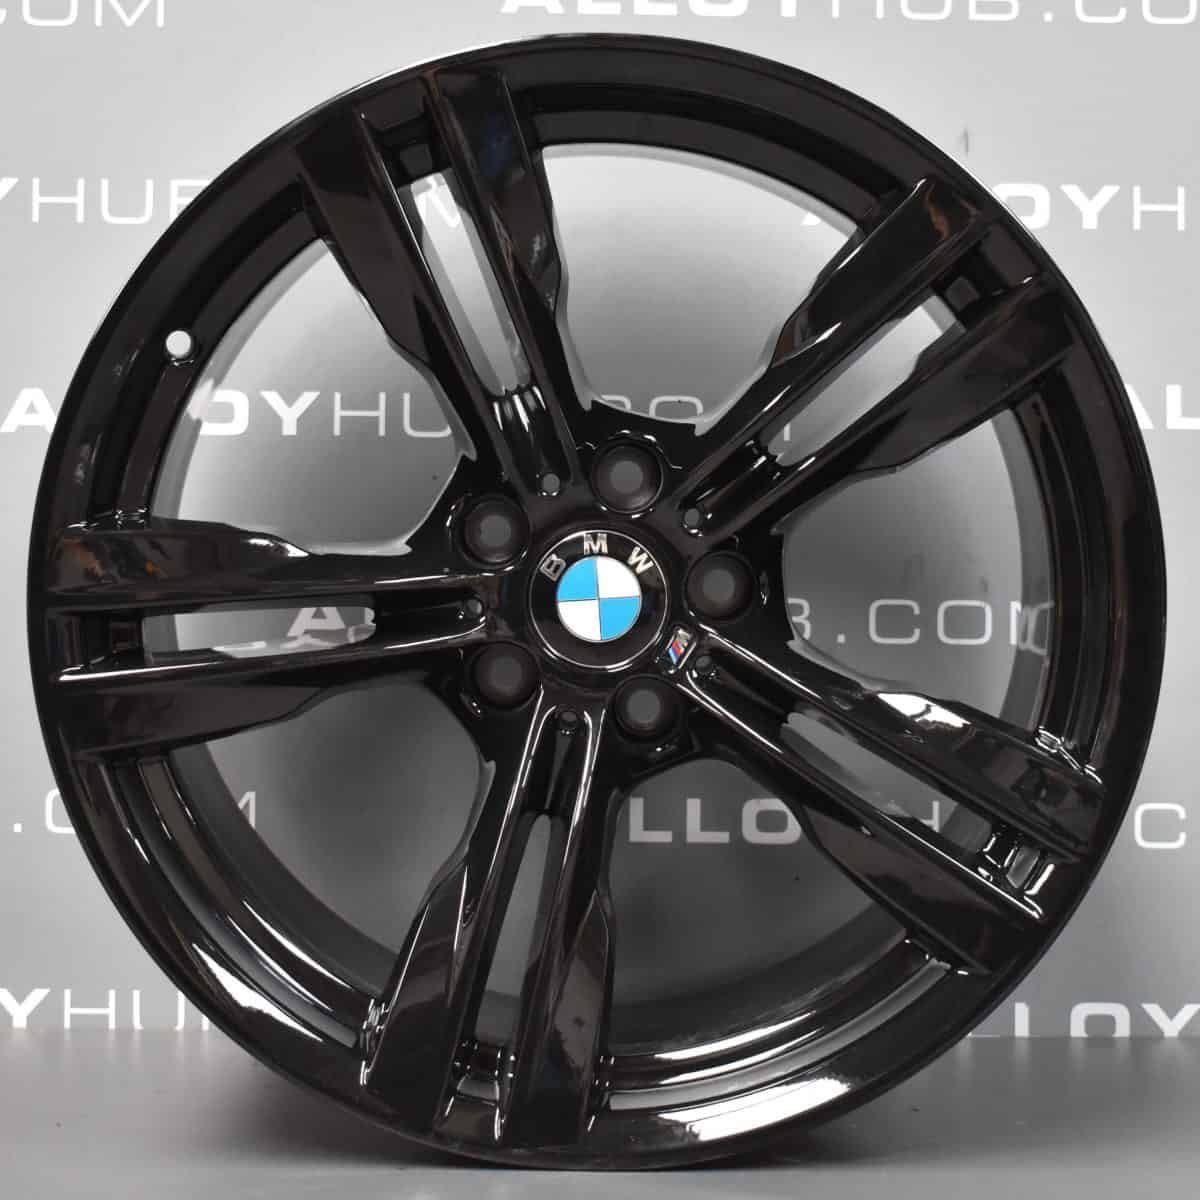 "Genuine BMW X5 X6 F15 F16 467M Sport 5 Twin Spoke 19"" inch Alloy Wheels with Gloss Black Finish 36117846786 36117846787"